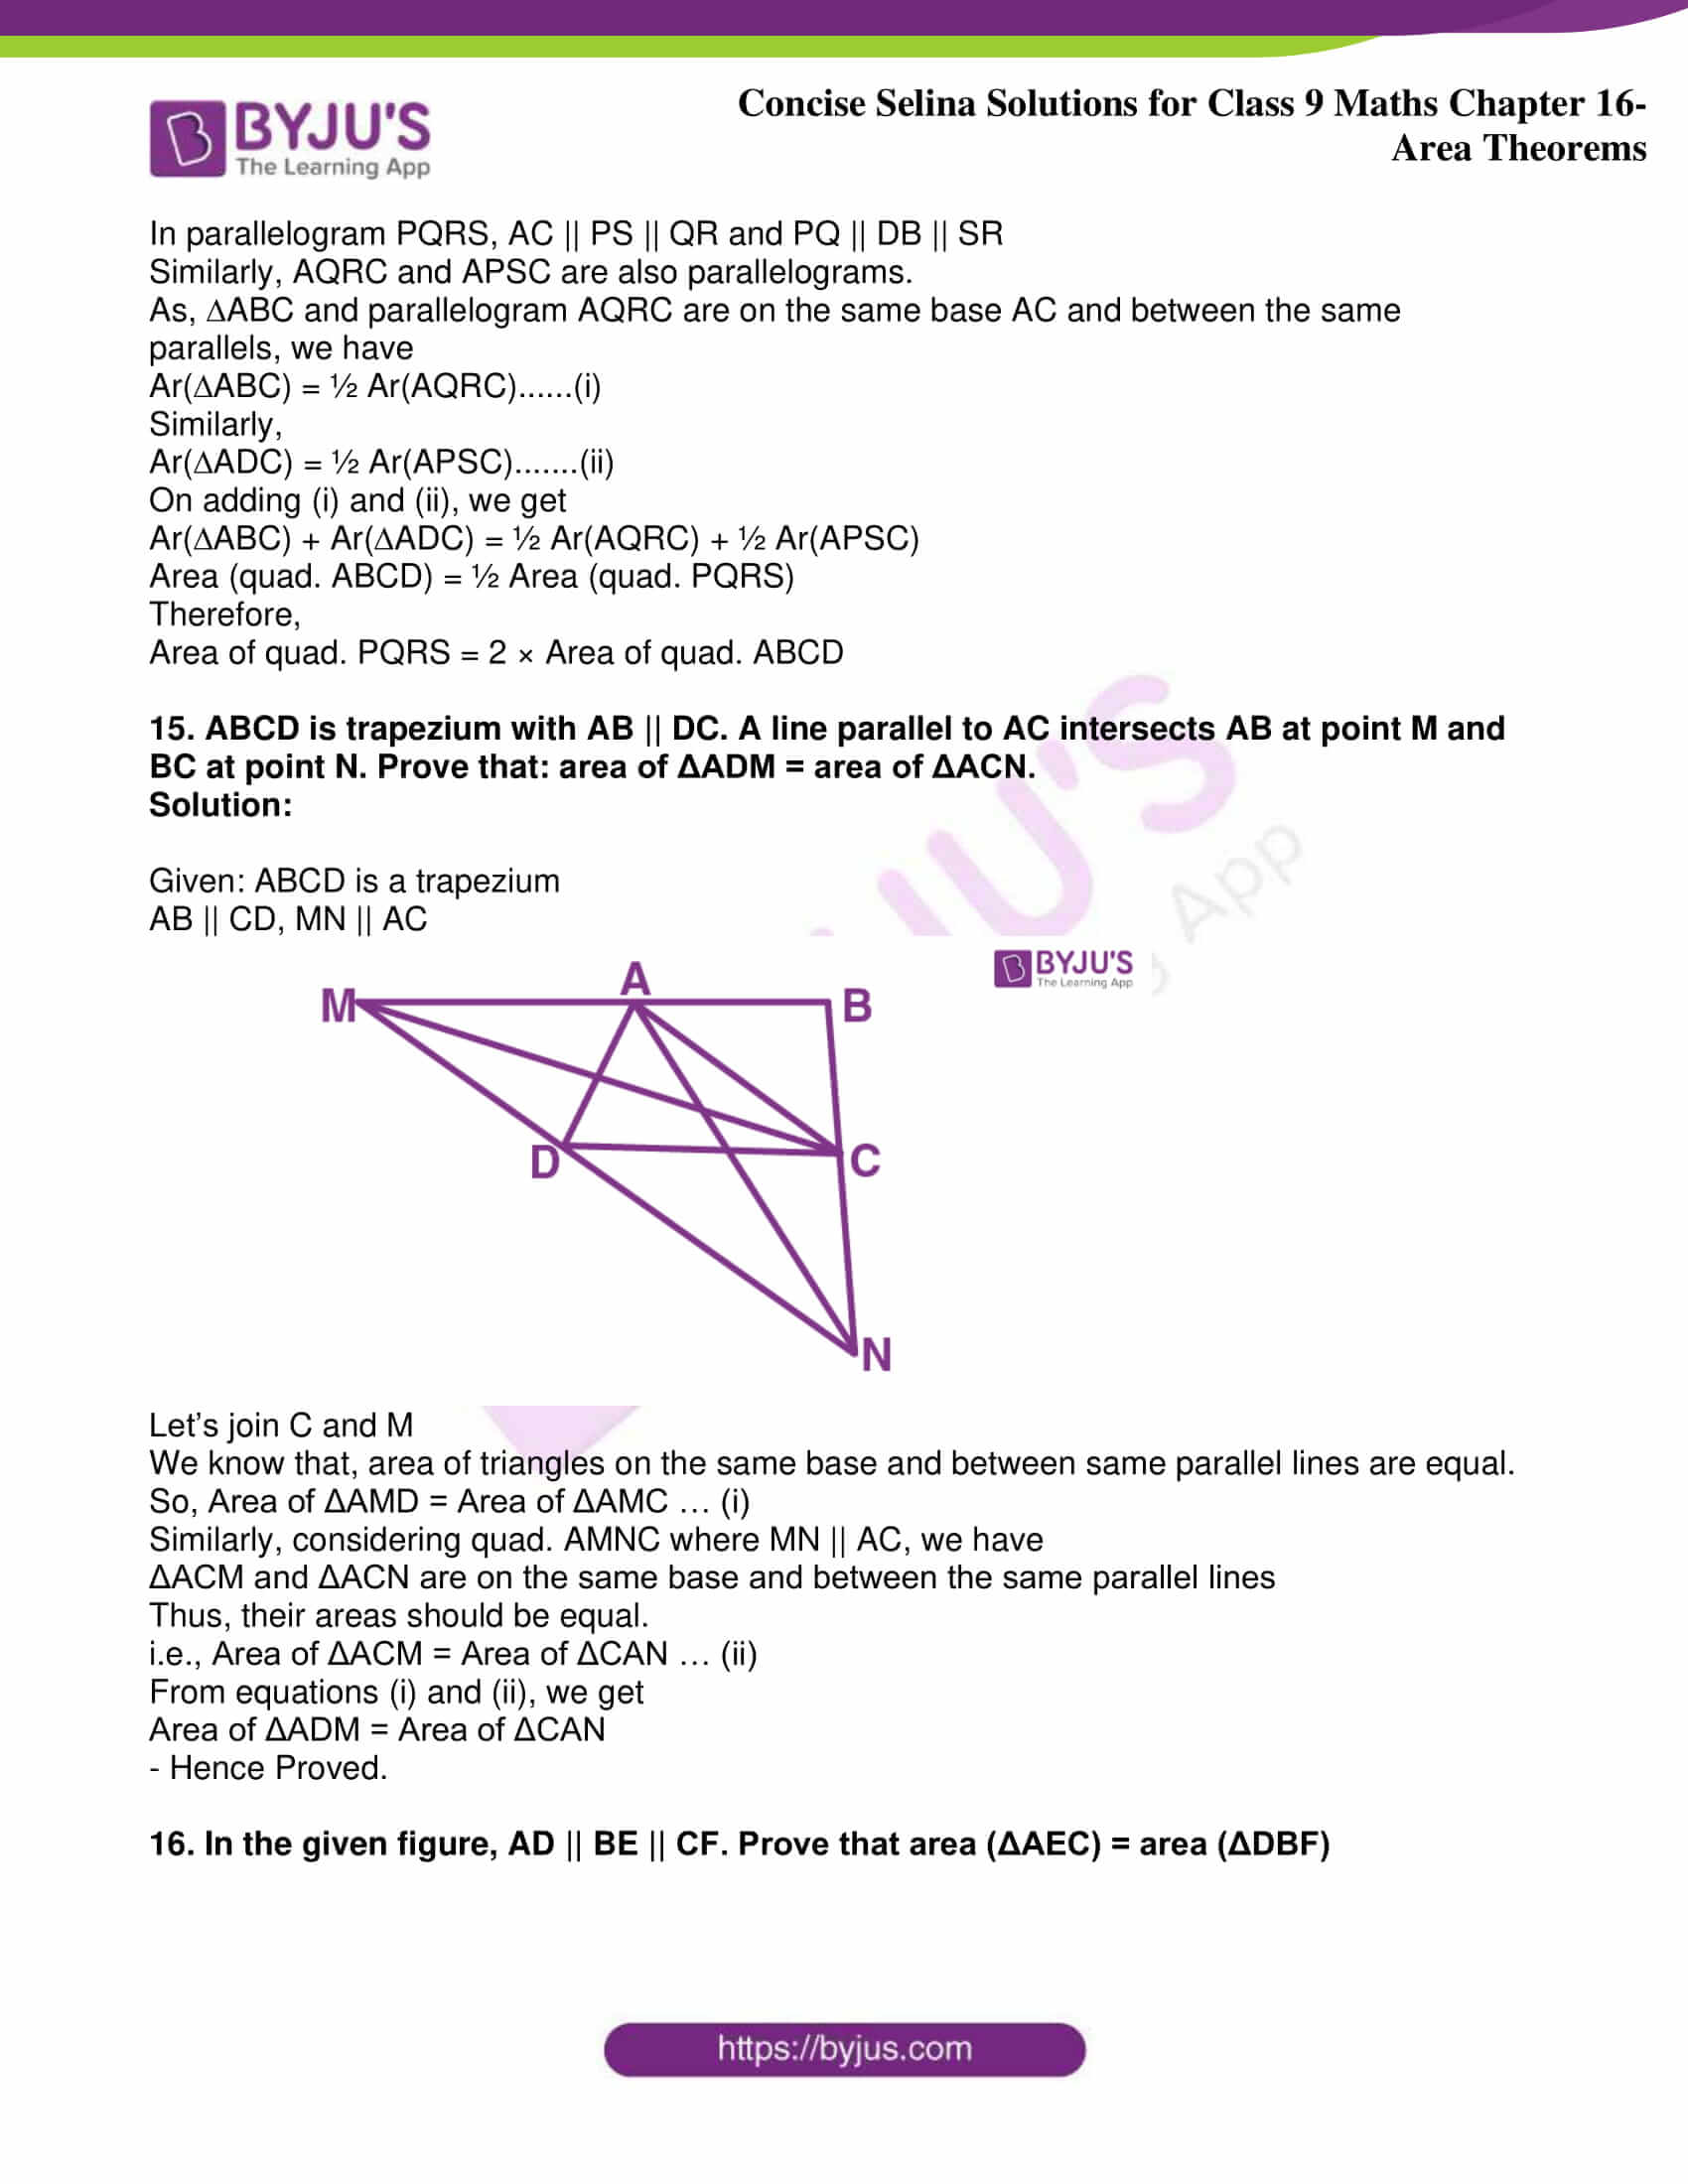 icse class 9 jun9 maths selina solutions chapter 16 area theorems 13